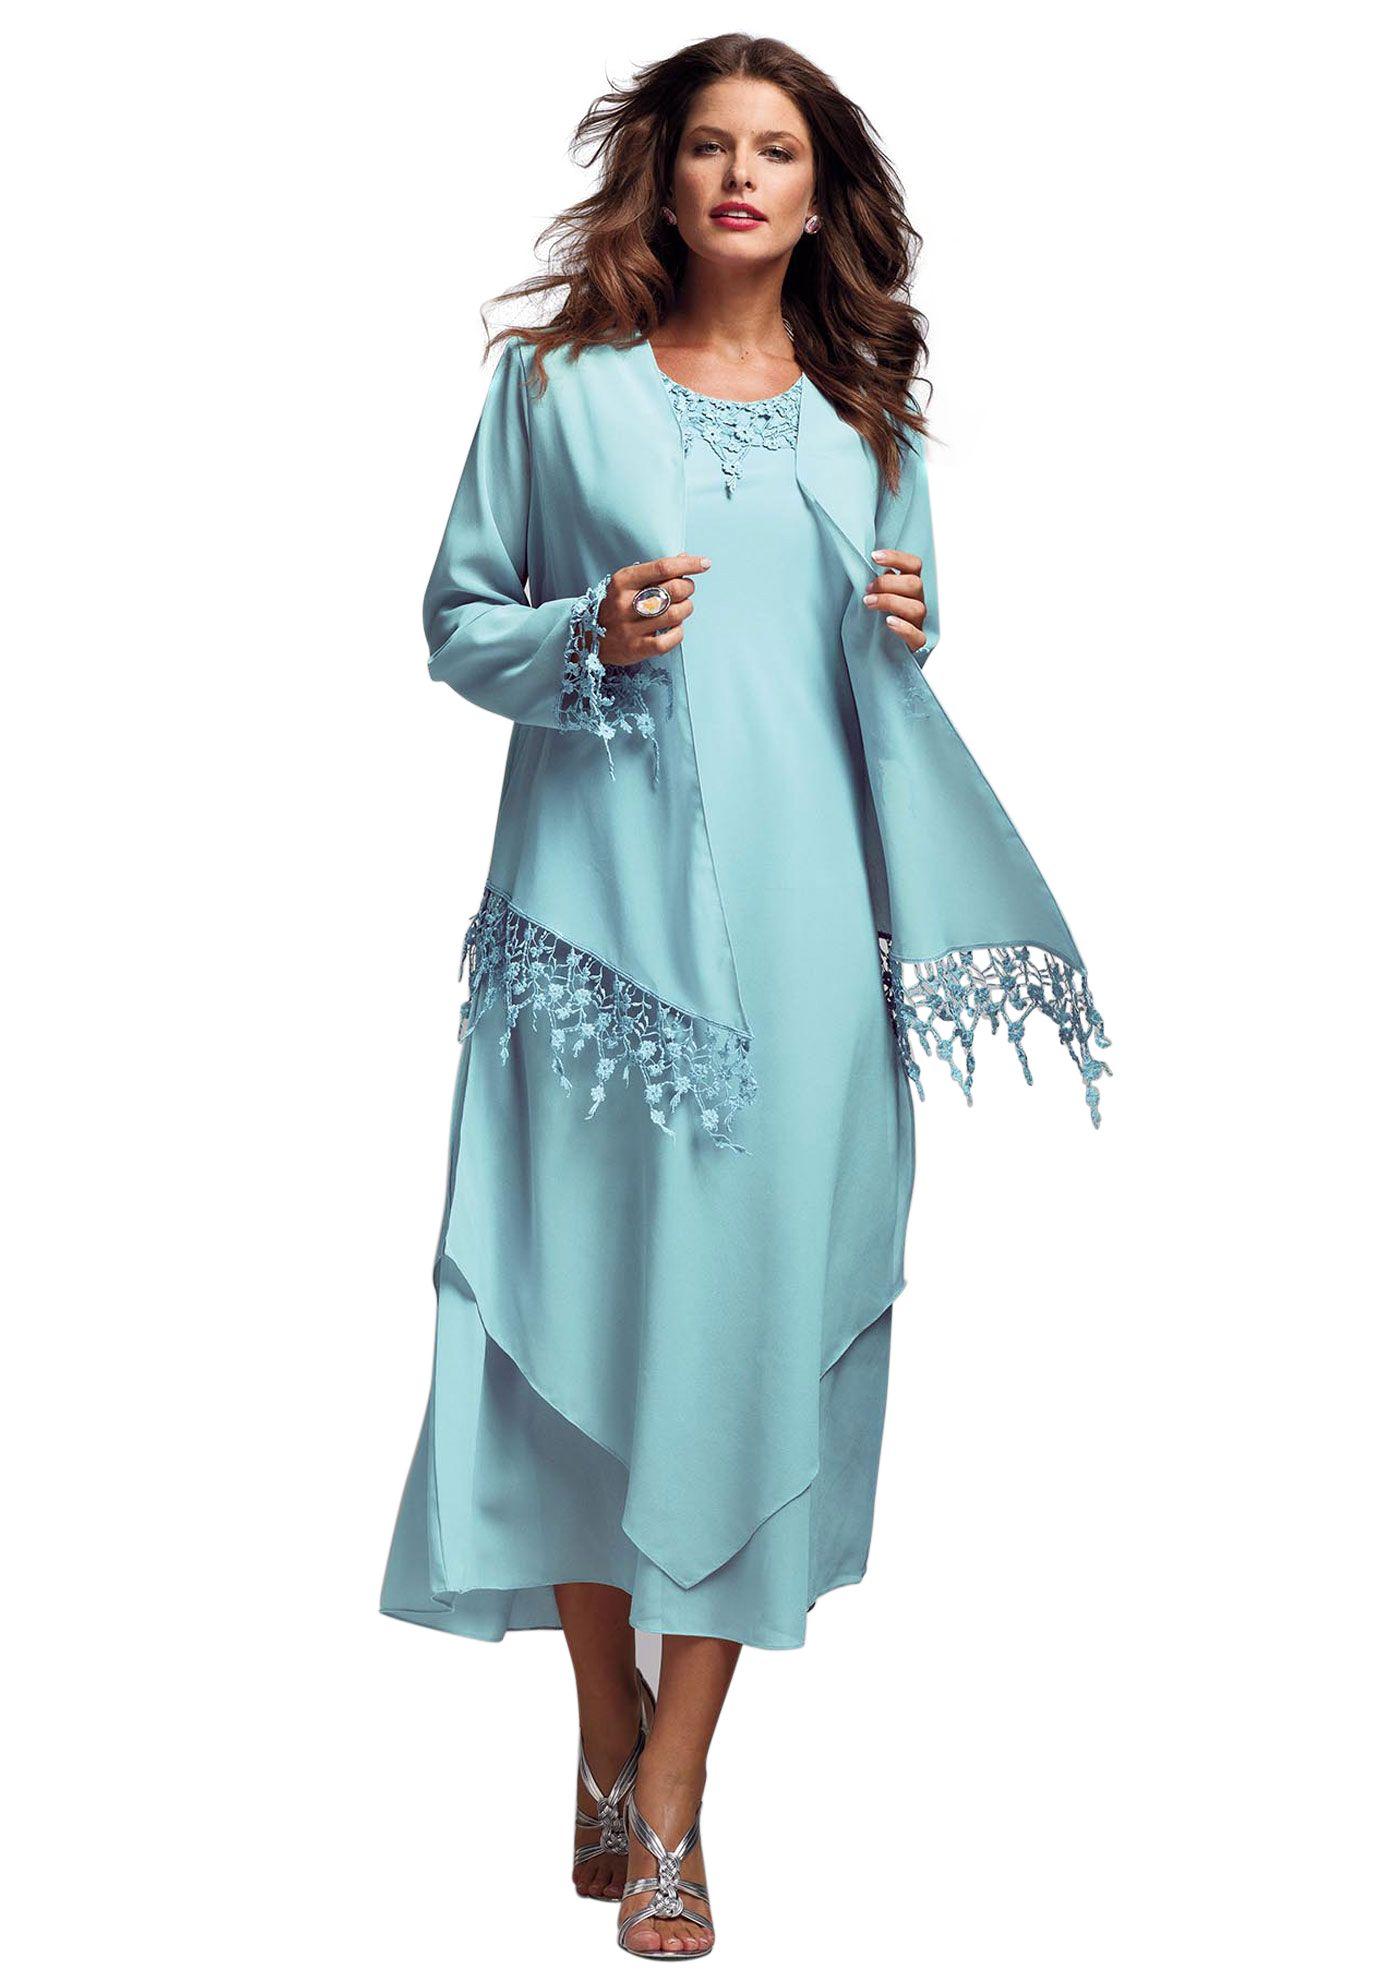 Plus Size : Special Occasion for Women | Roamans | Dresses ...